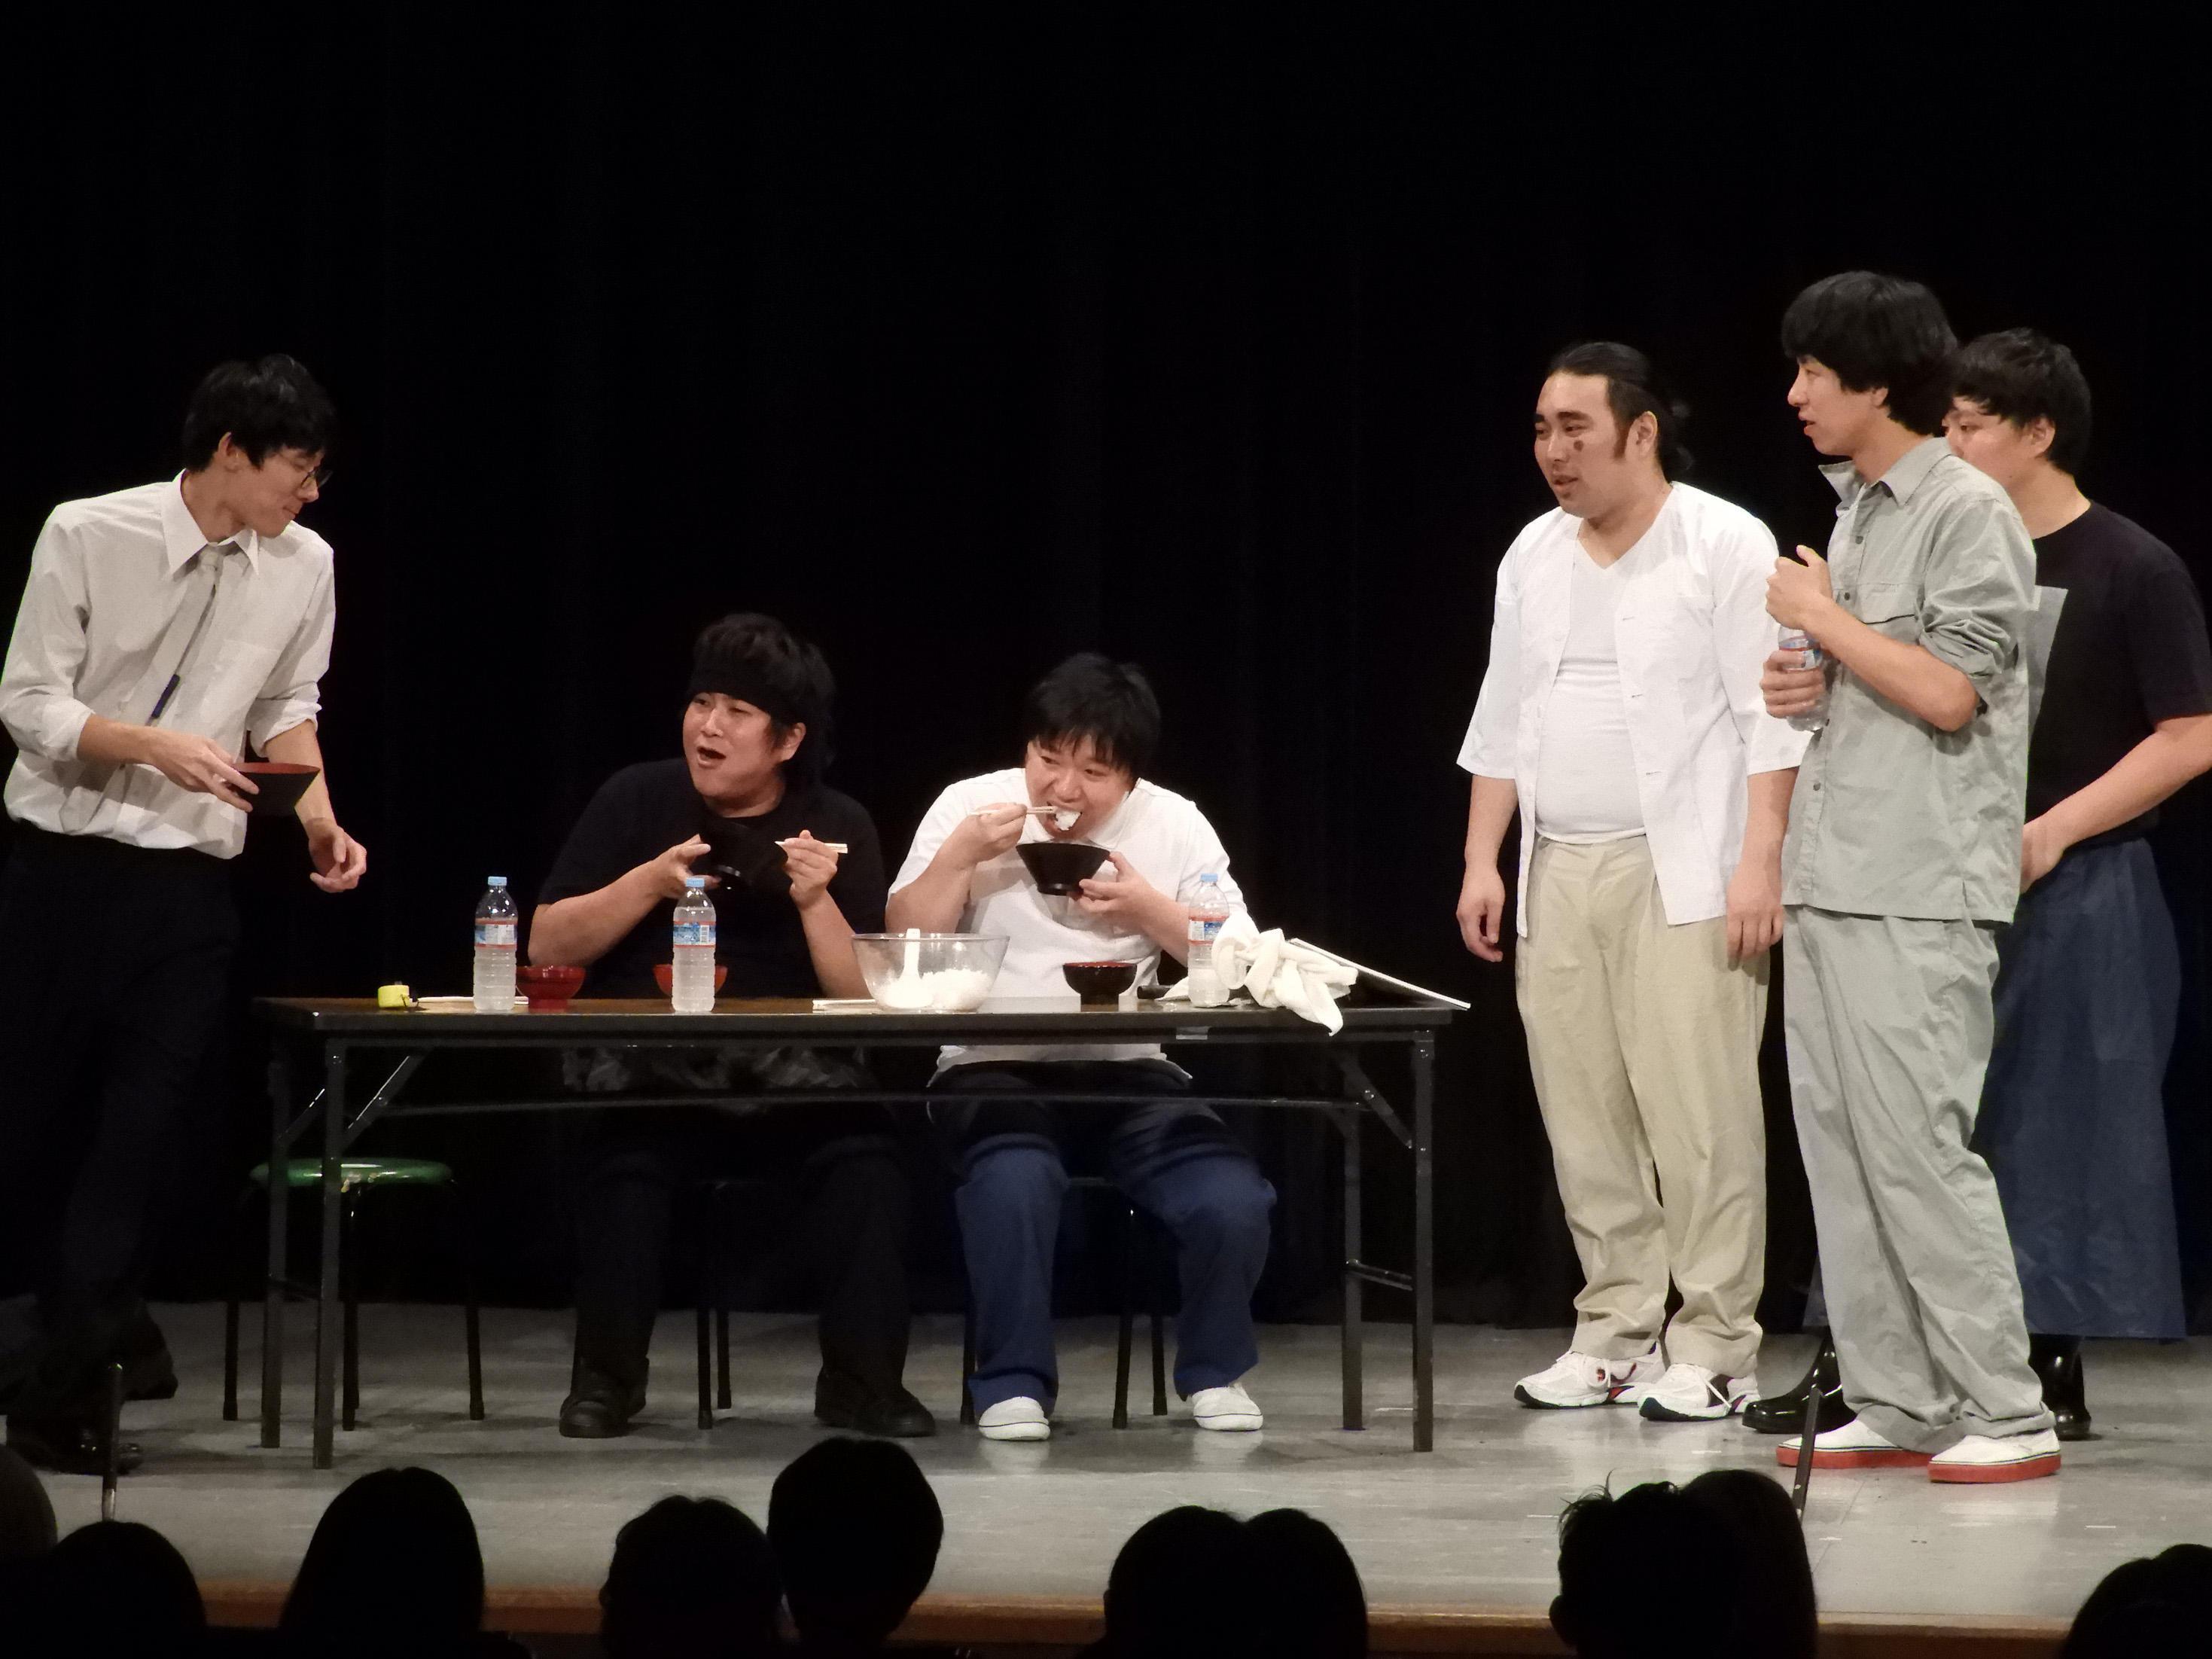 http://news.yoshimoto.co.jp/20180619144650-b9060bd56d5e083c432f8261abc96d66a2787491.jpg